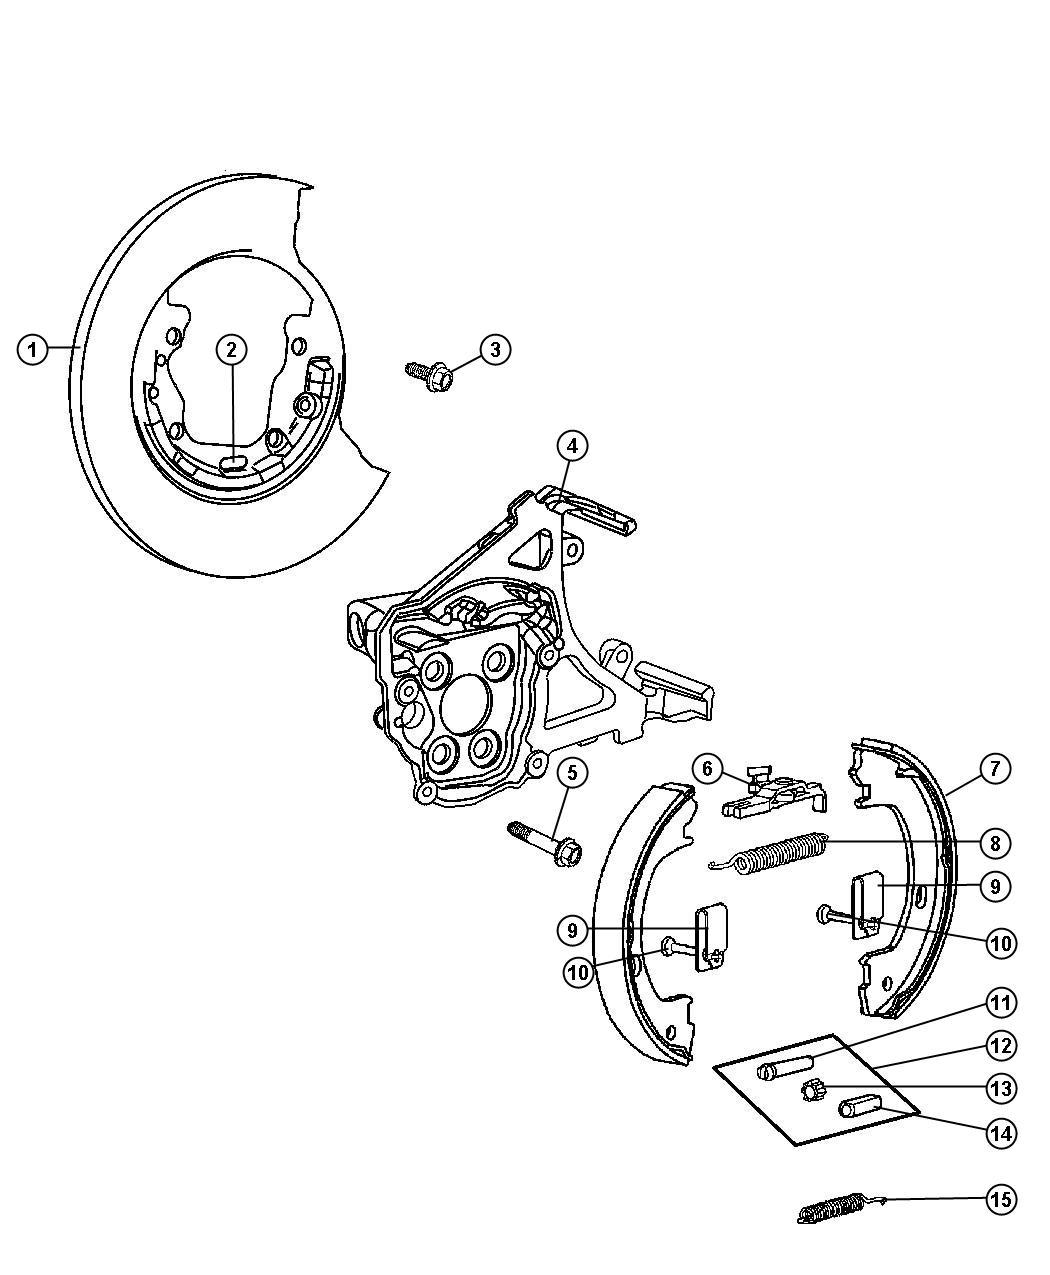 2010 Dodge Dakota Adapter. Disc brake caliper. Right